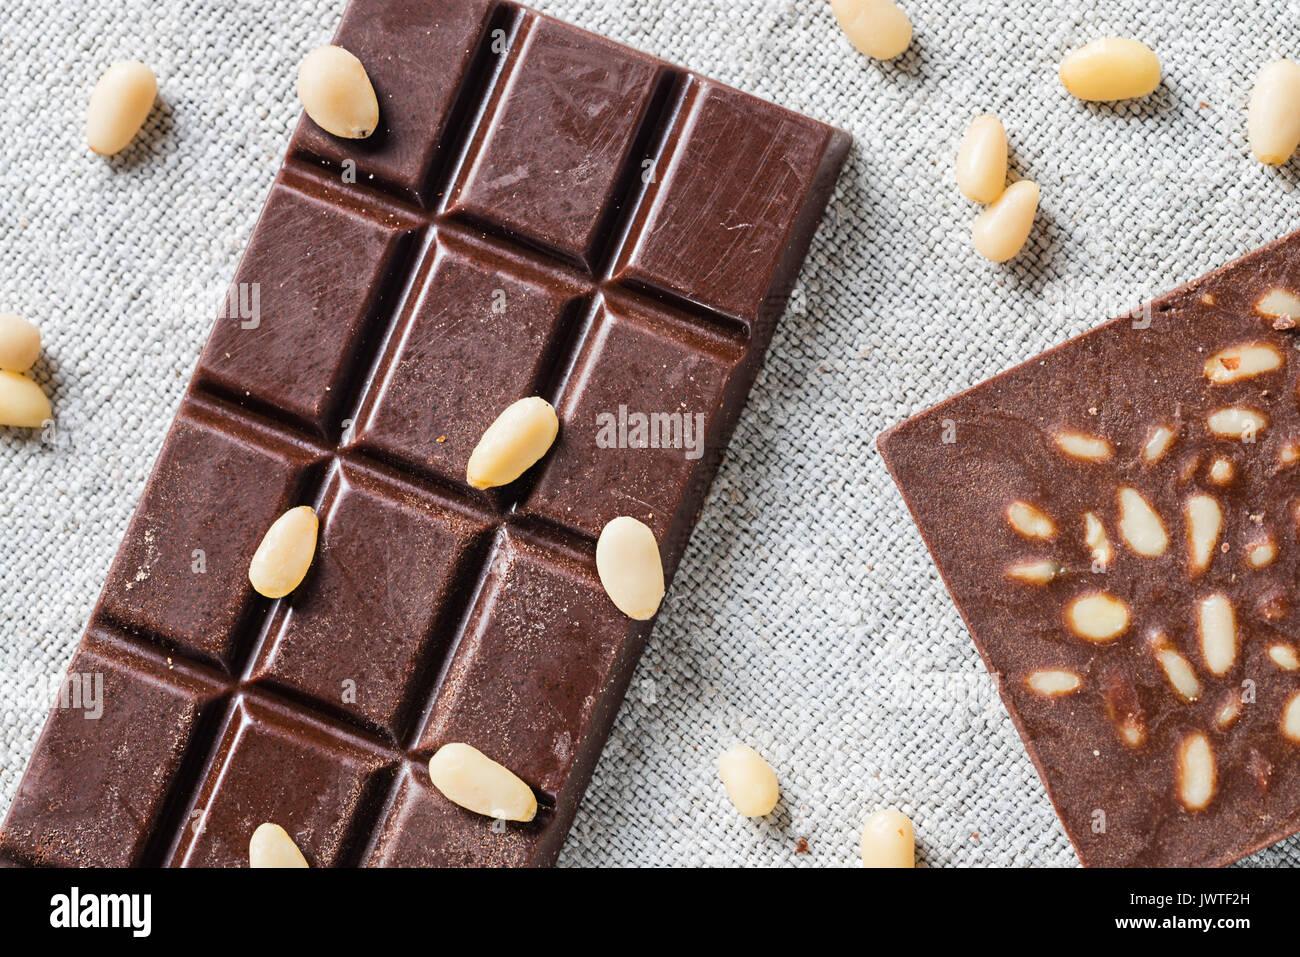 Handmade Chocolate Stock Photos & Handmade Chocolate Stock